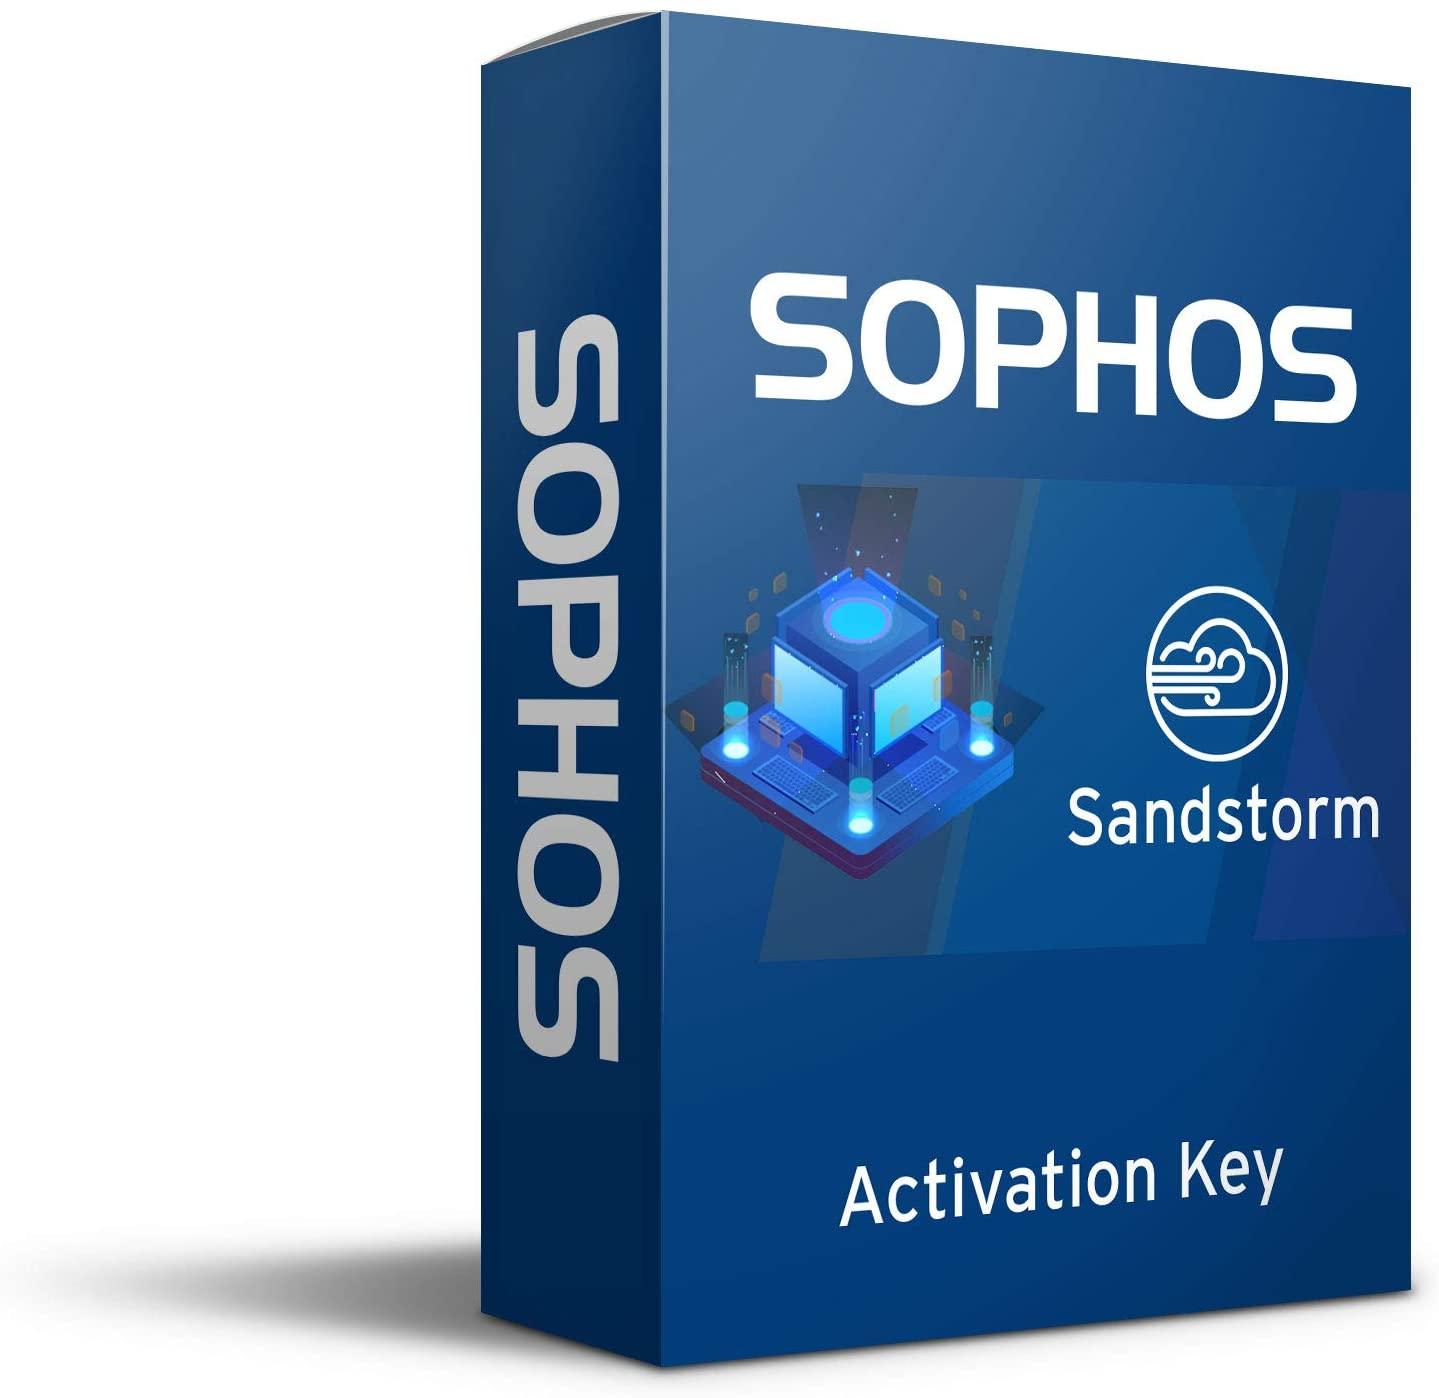 Sophos SG 135 Sandstorm 1YR Subscription License (SS1D1CSAA)